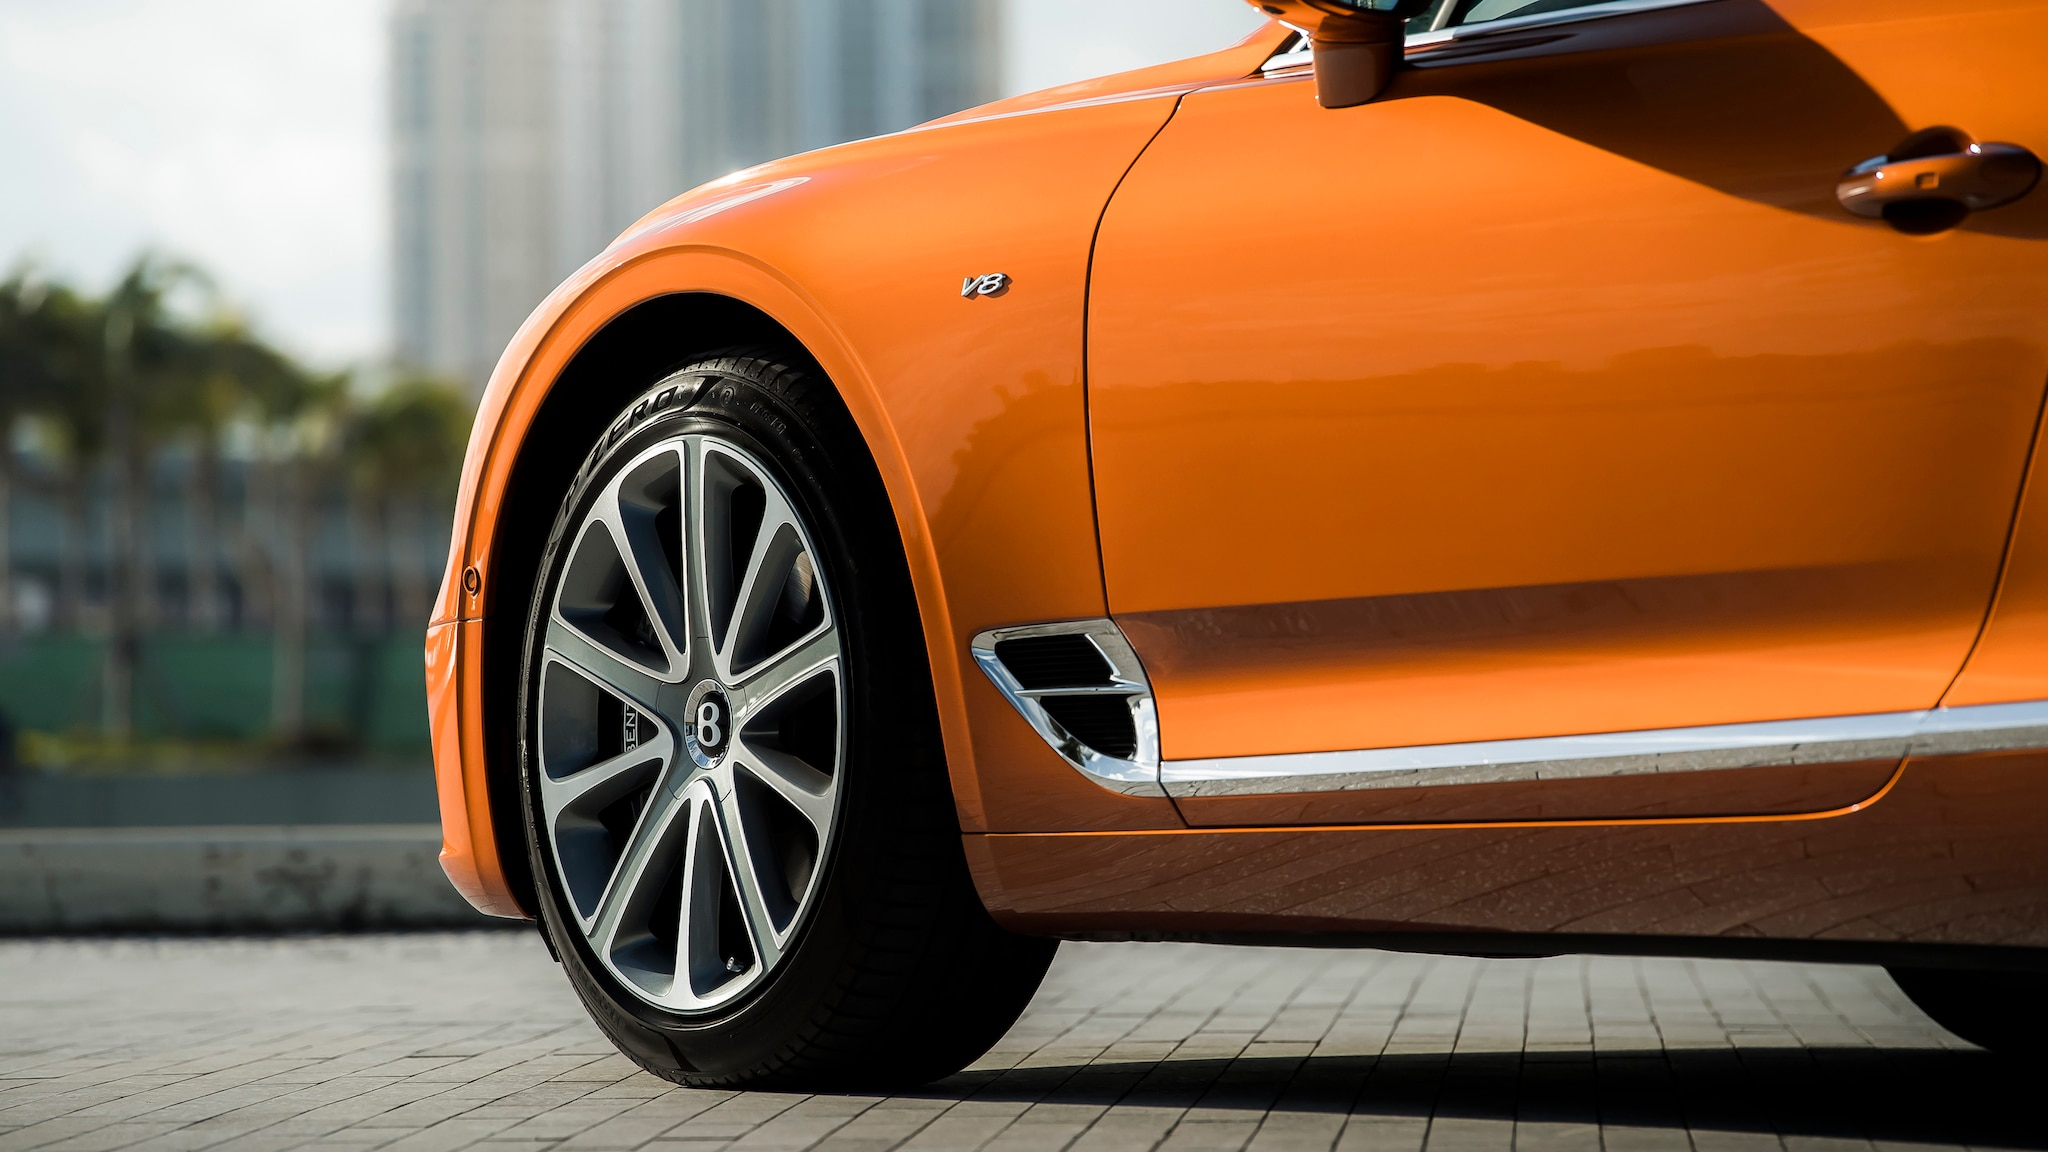 Bentley Continental GT V8 11 1